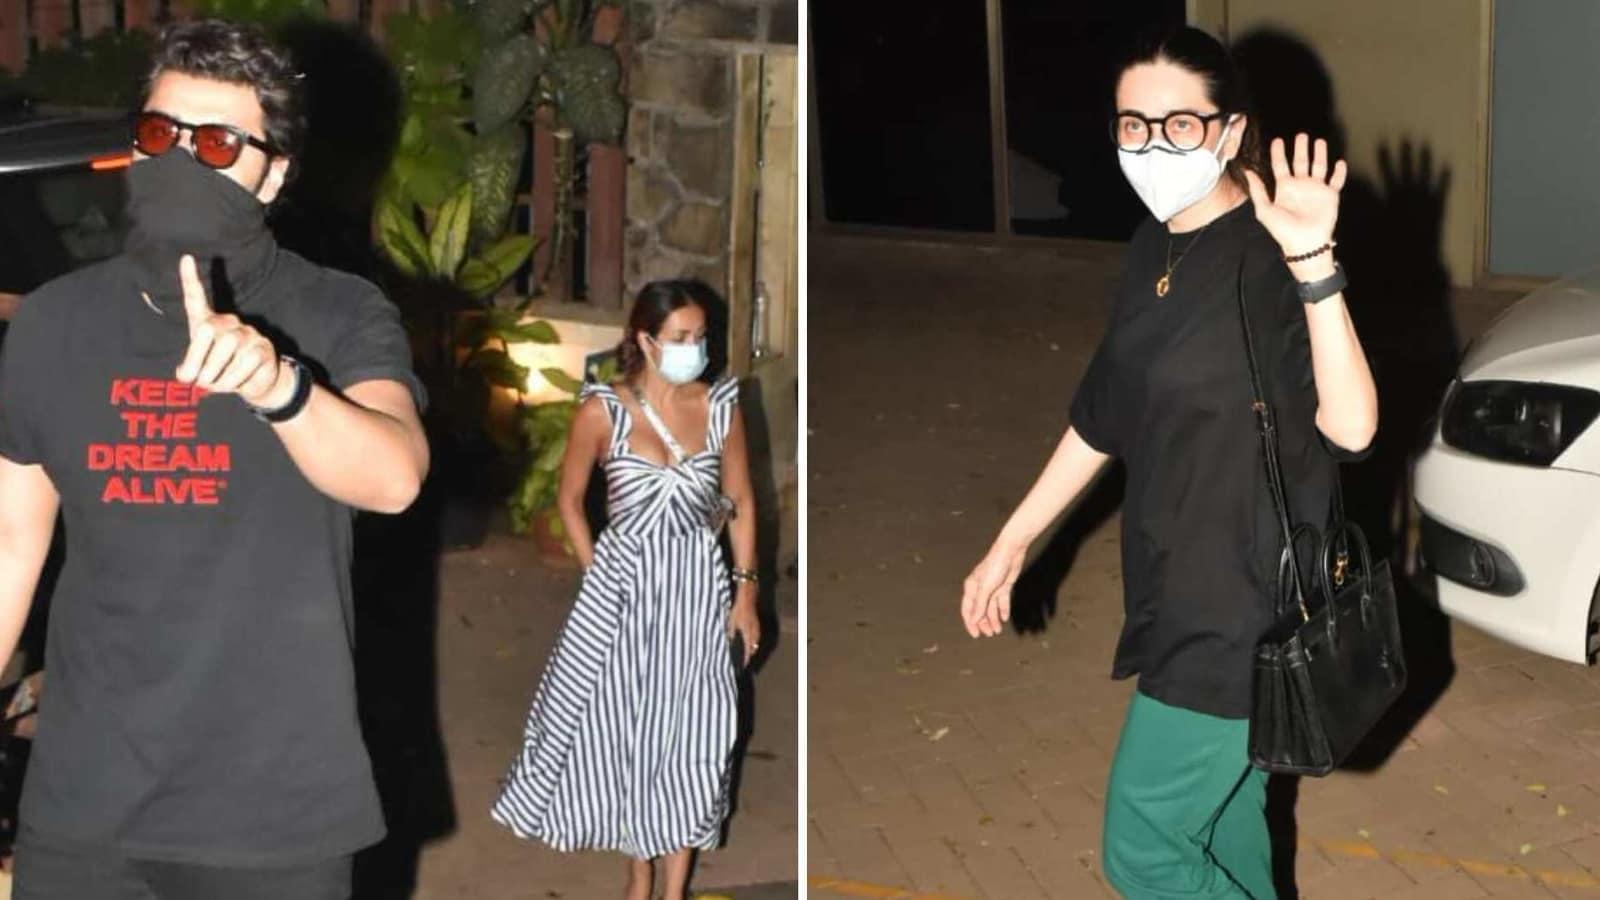 Arjun Kapoor-Malaika Arora and Karisma Kapoor visit Saif Ali Khan and Kareena Kapoor's newborn. See photos - Hindustan Times